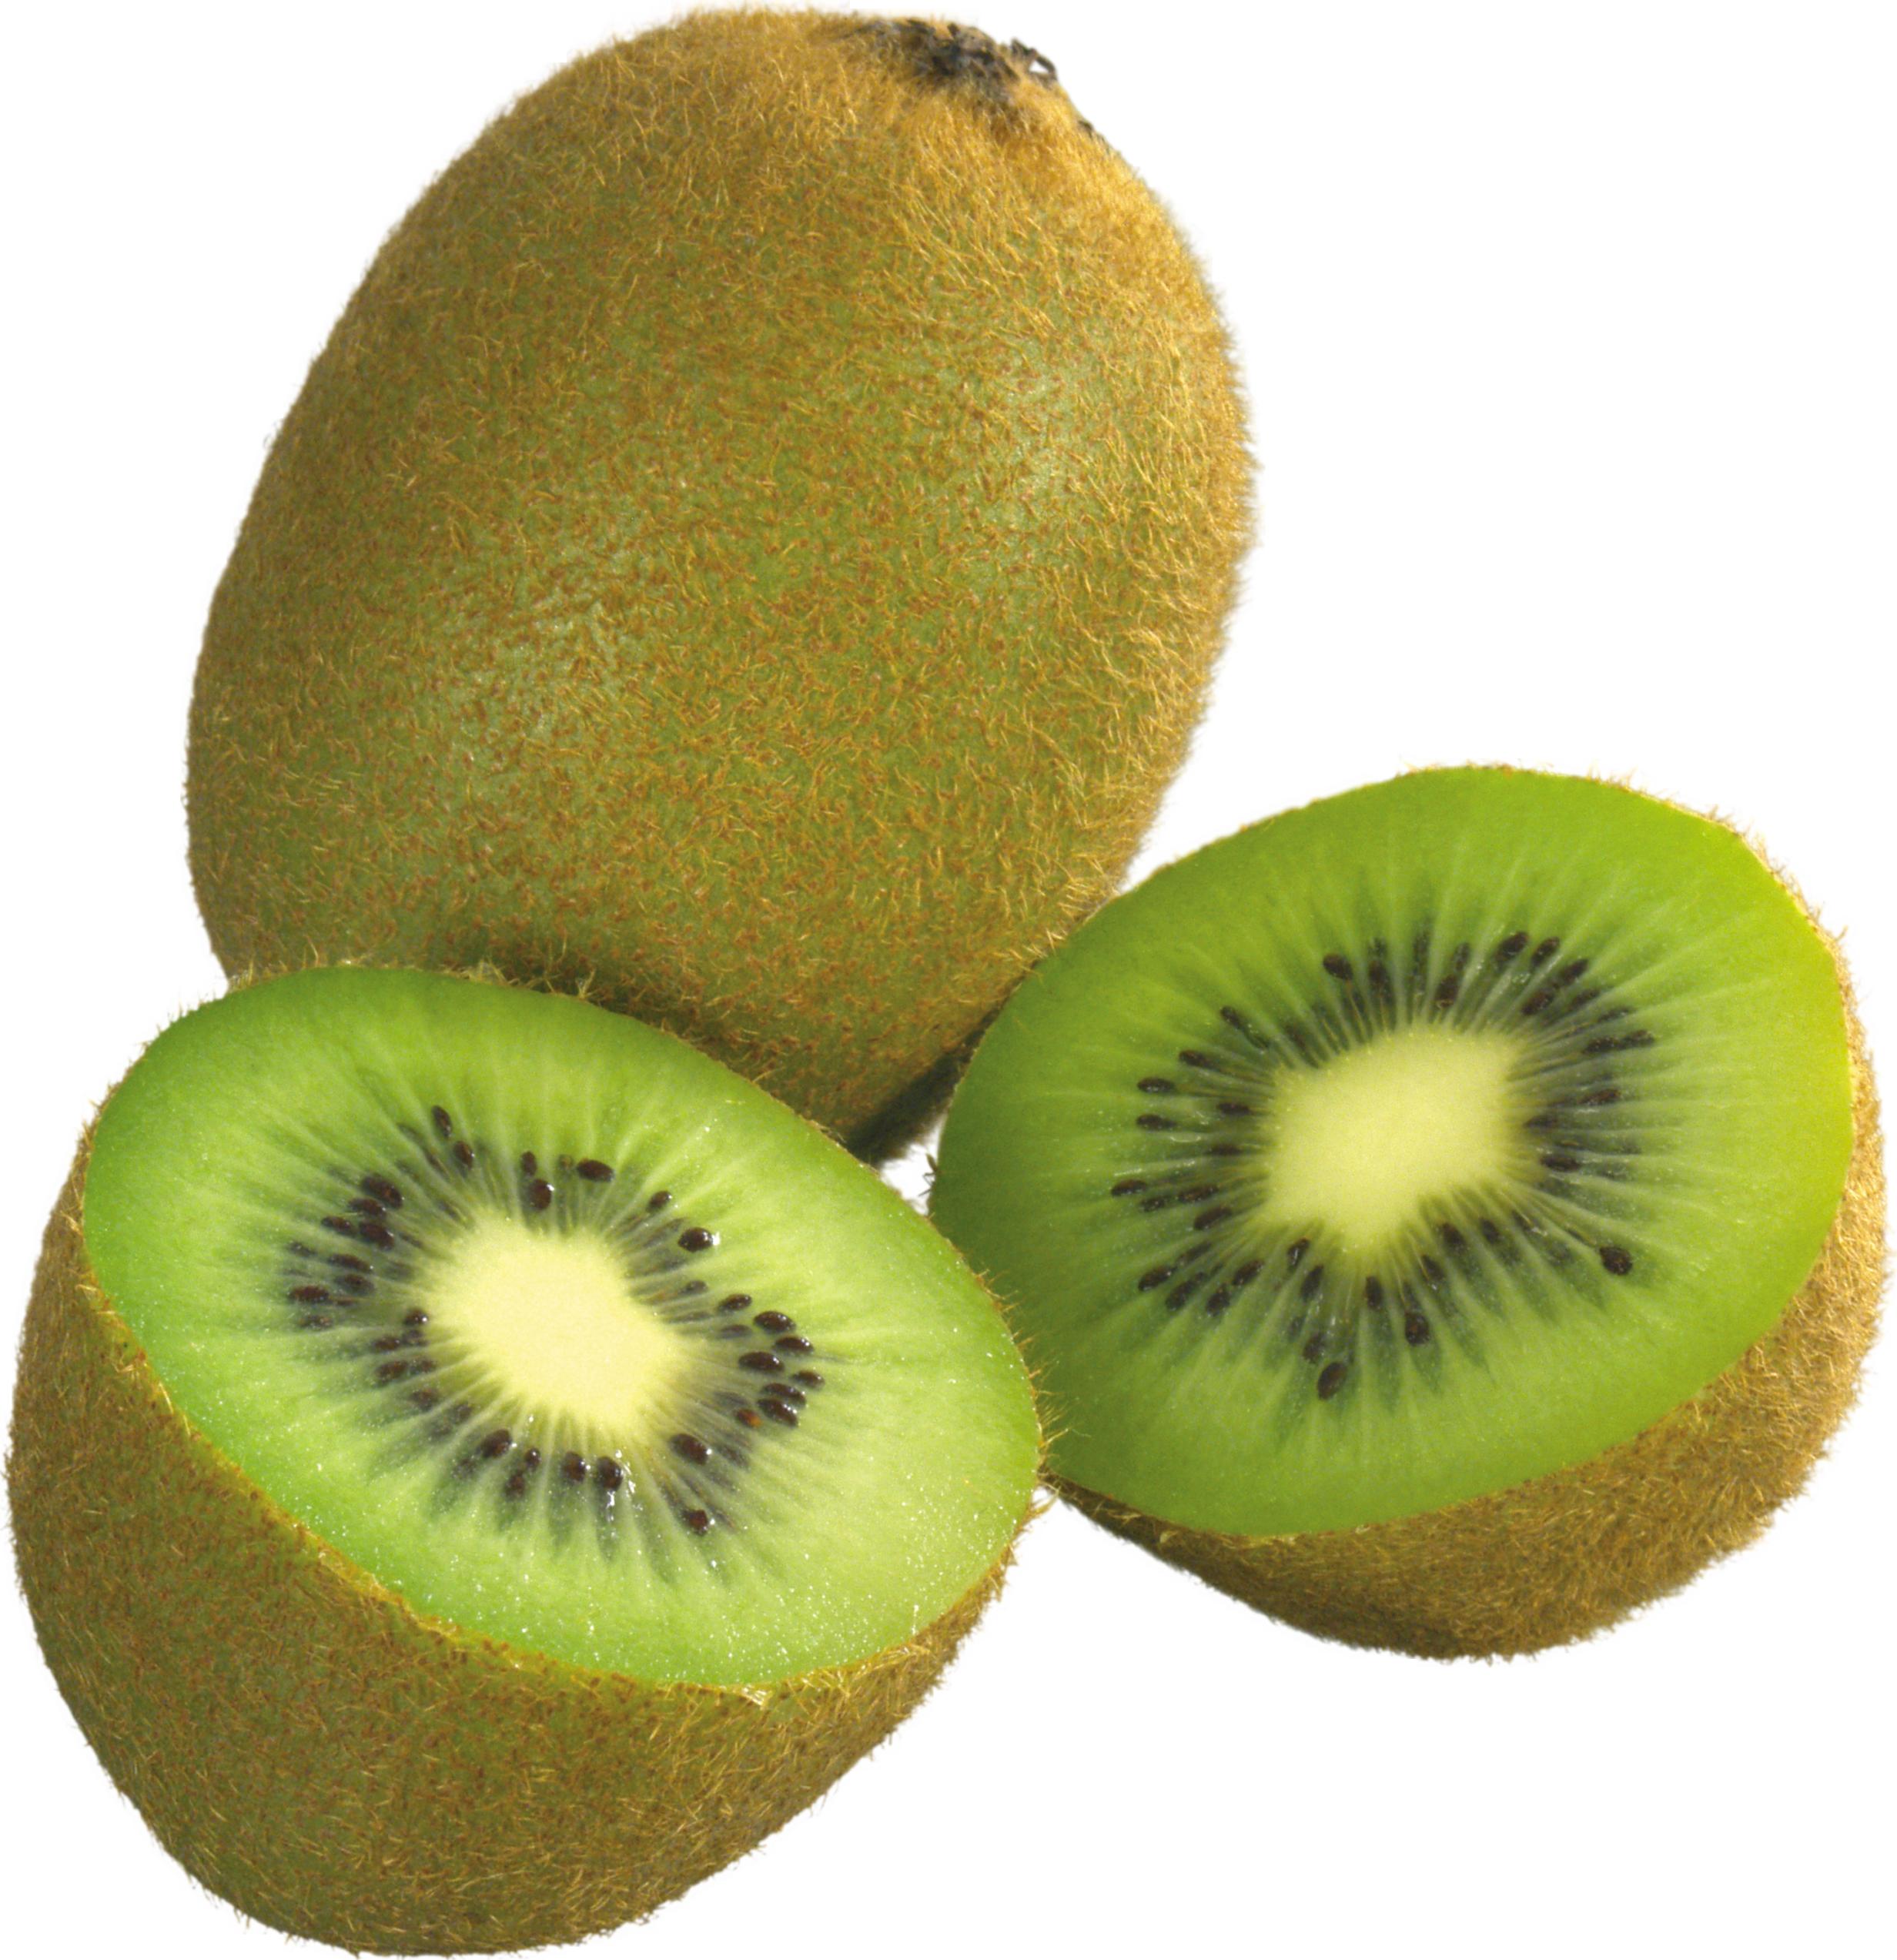 Kiwi PNG images, free fruit kiwi PNG pictures download.